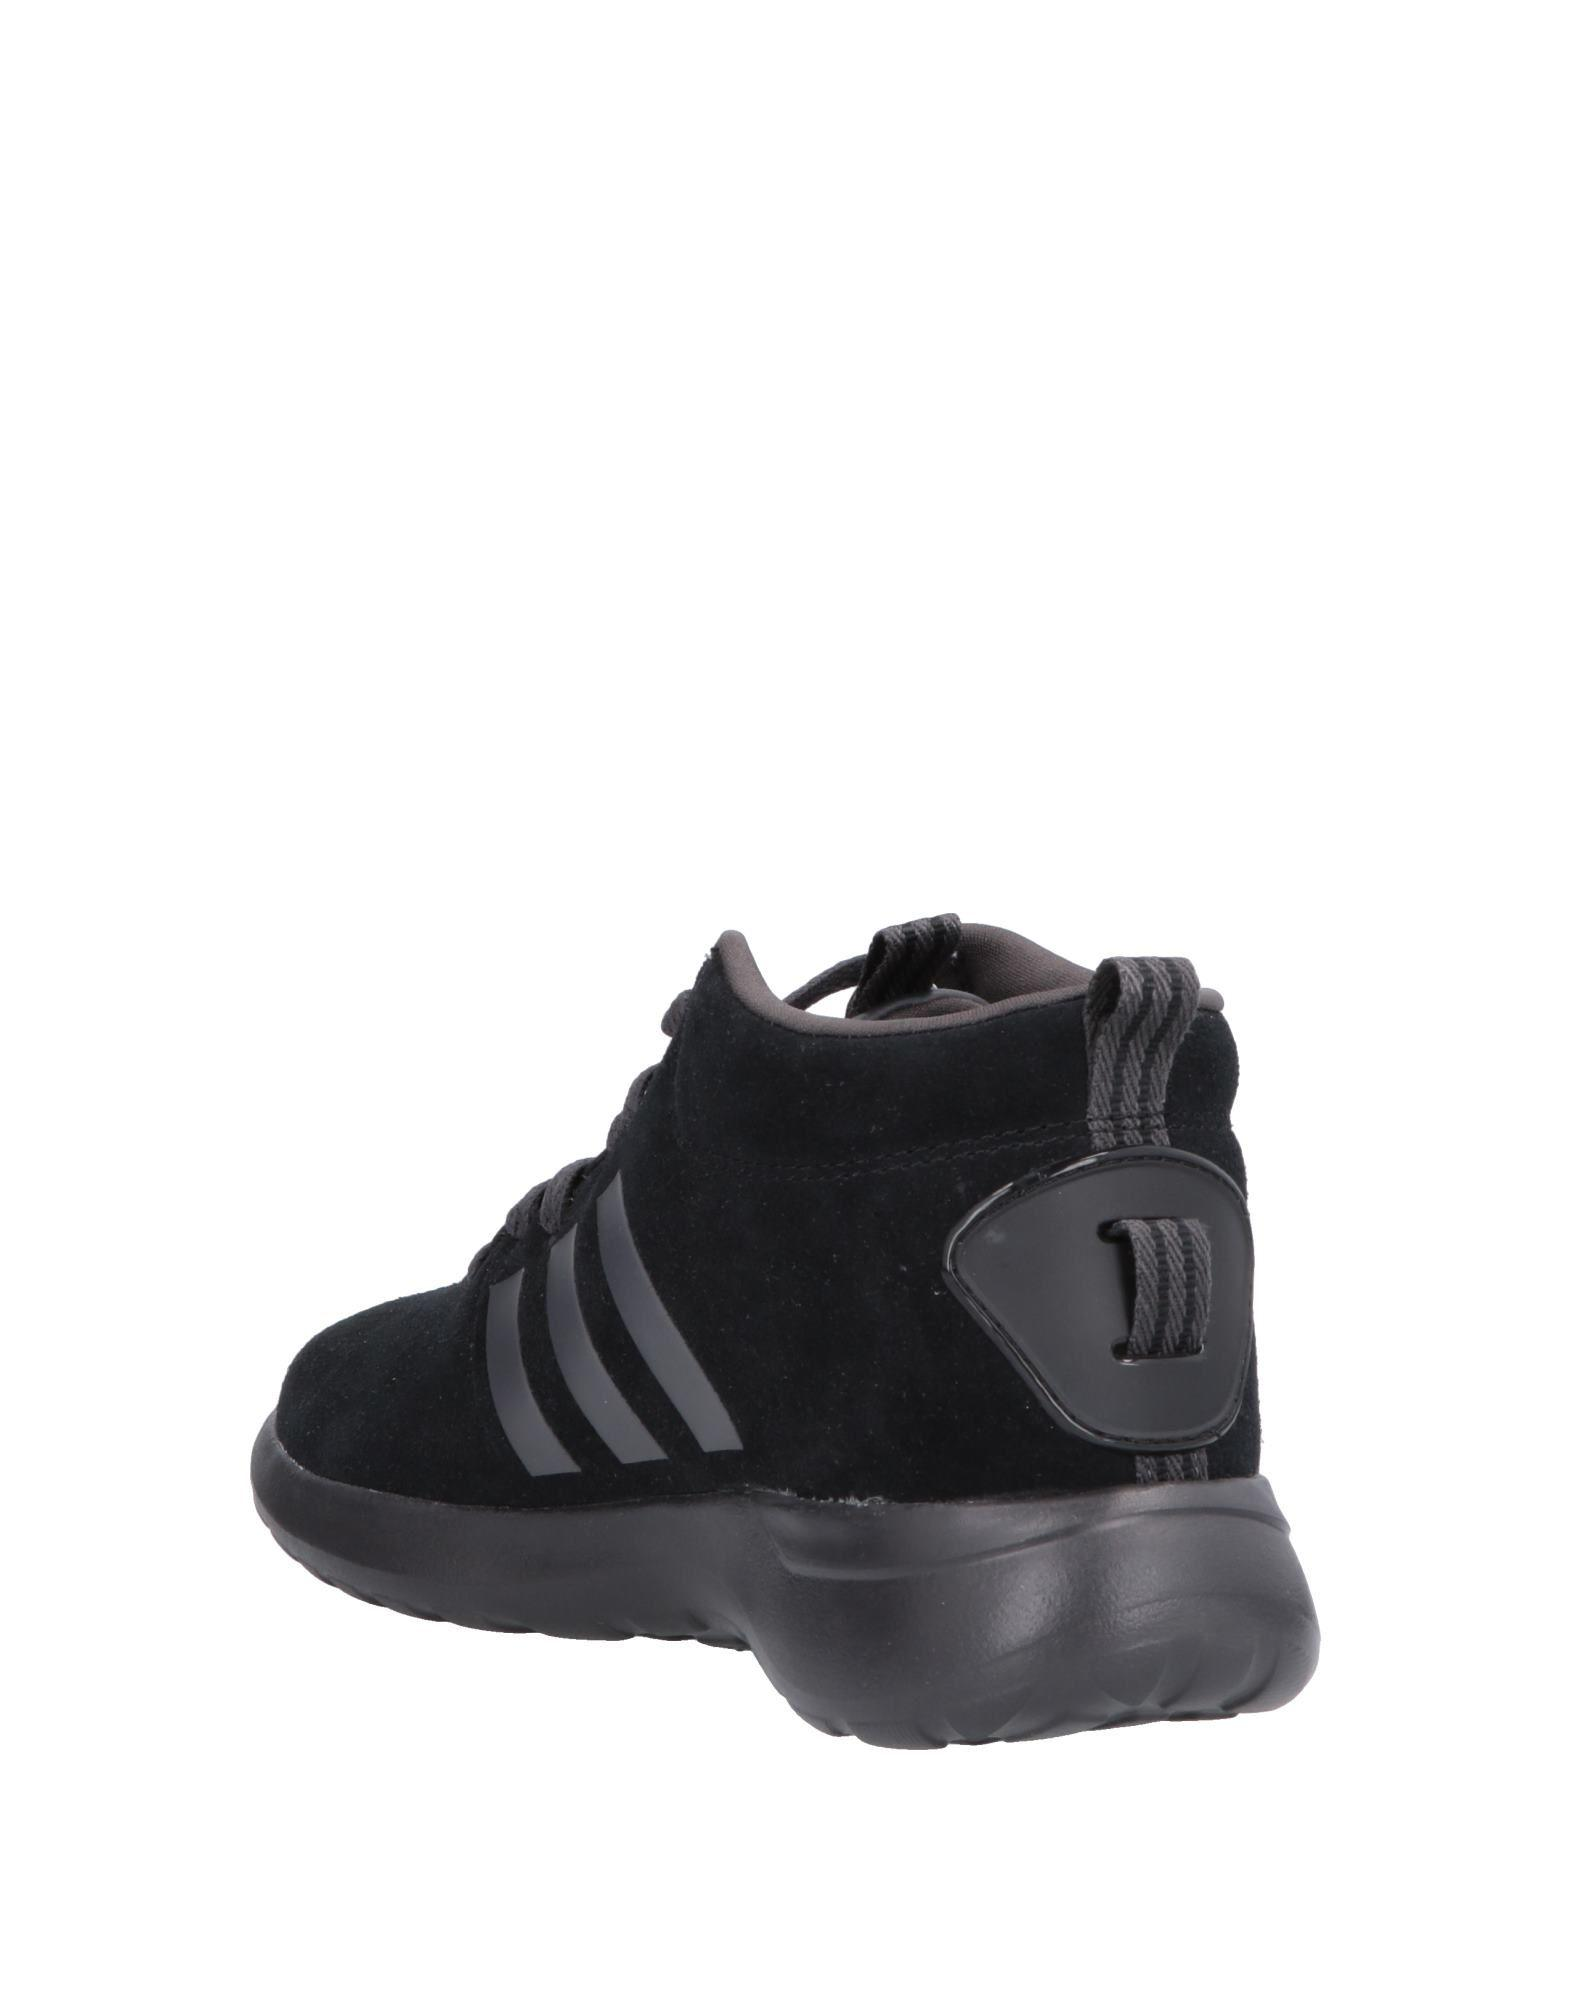 huge discount 34b27 e0834 adidas-neo-Black-High-tops-Sneakers.jpeg